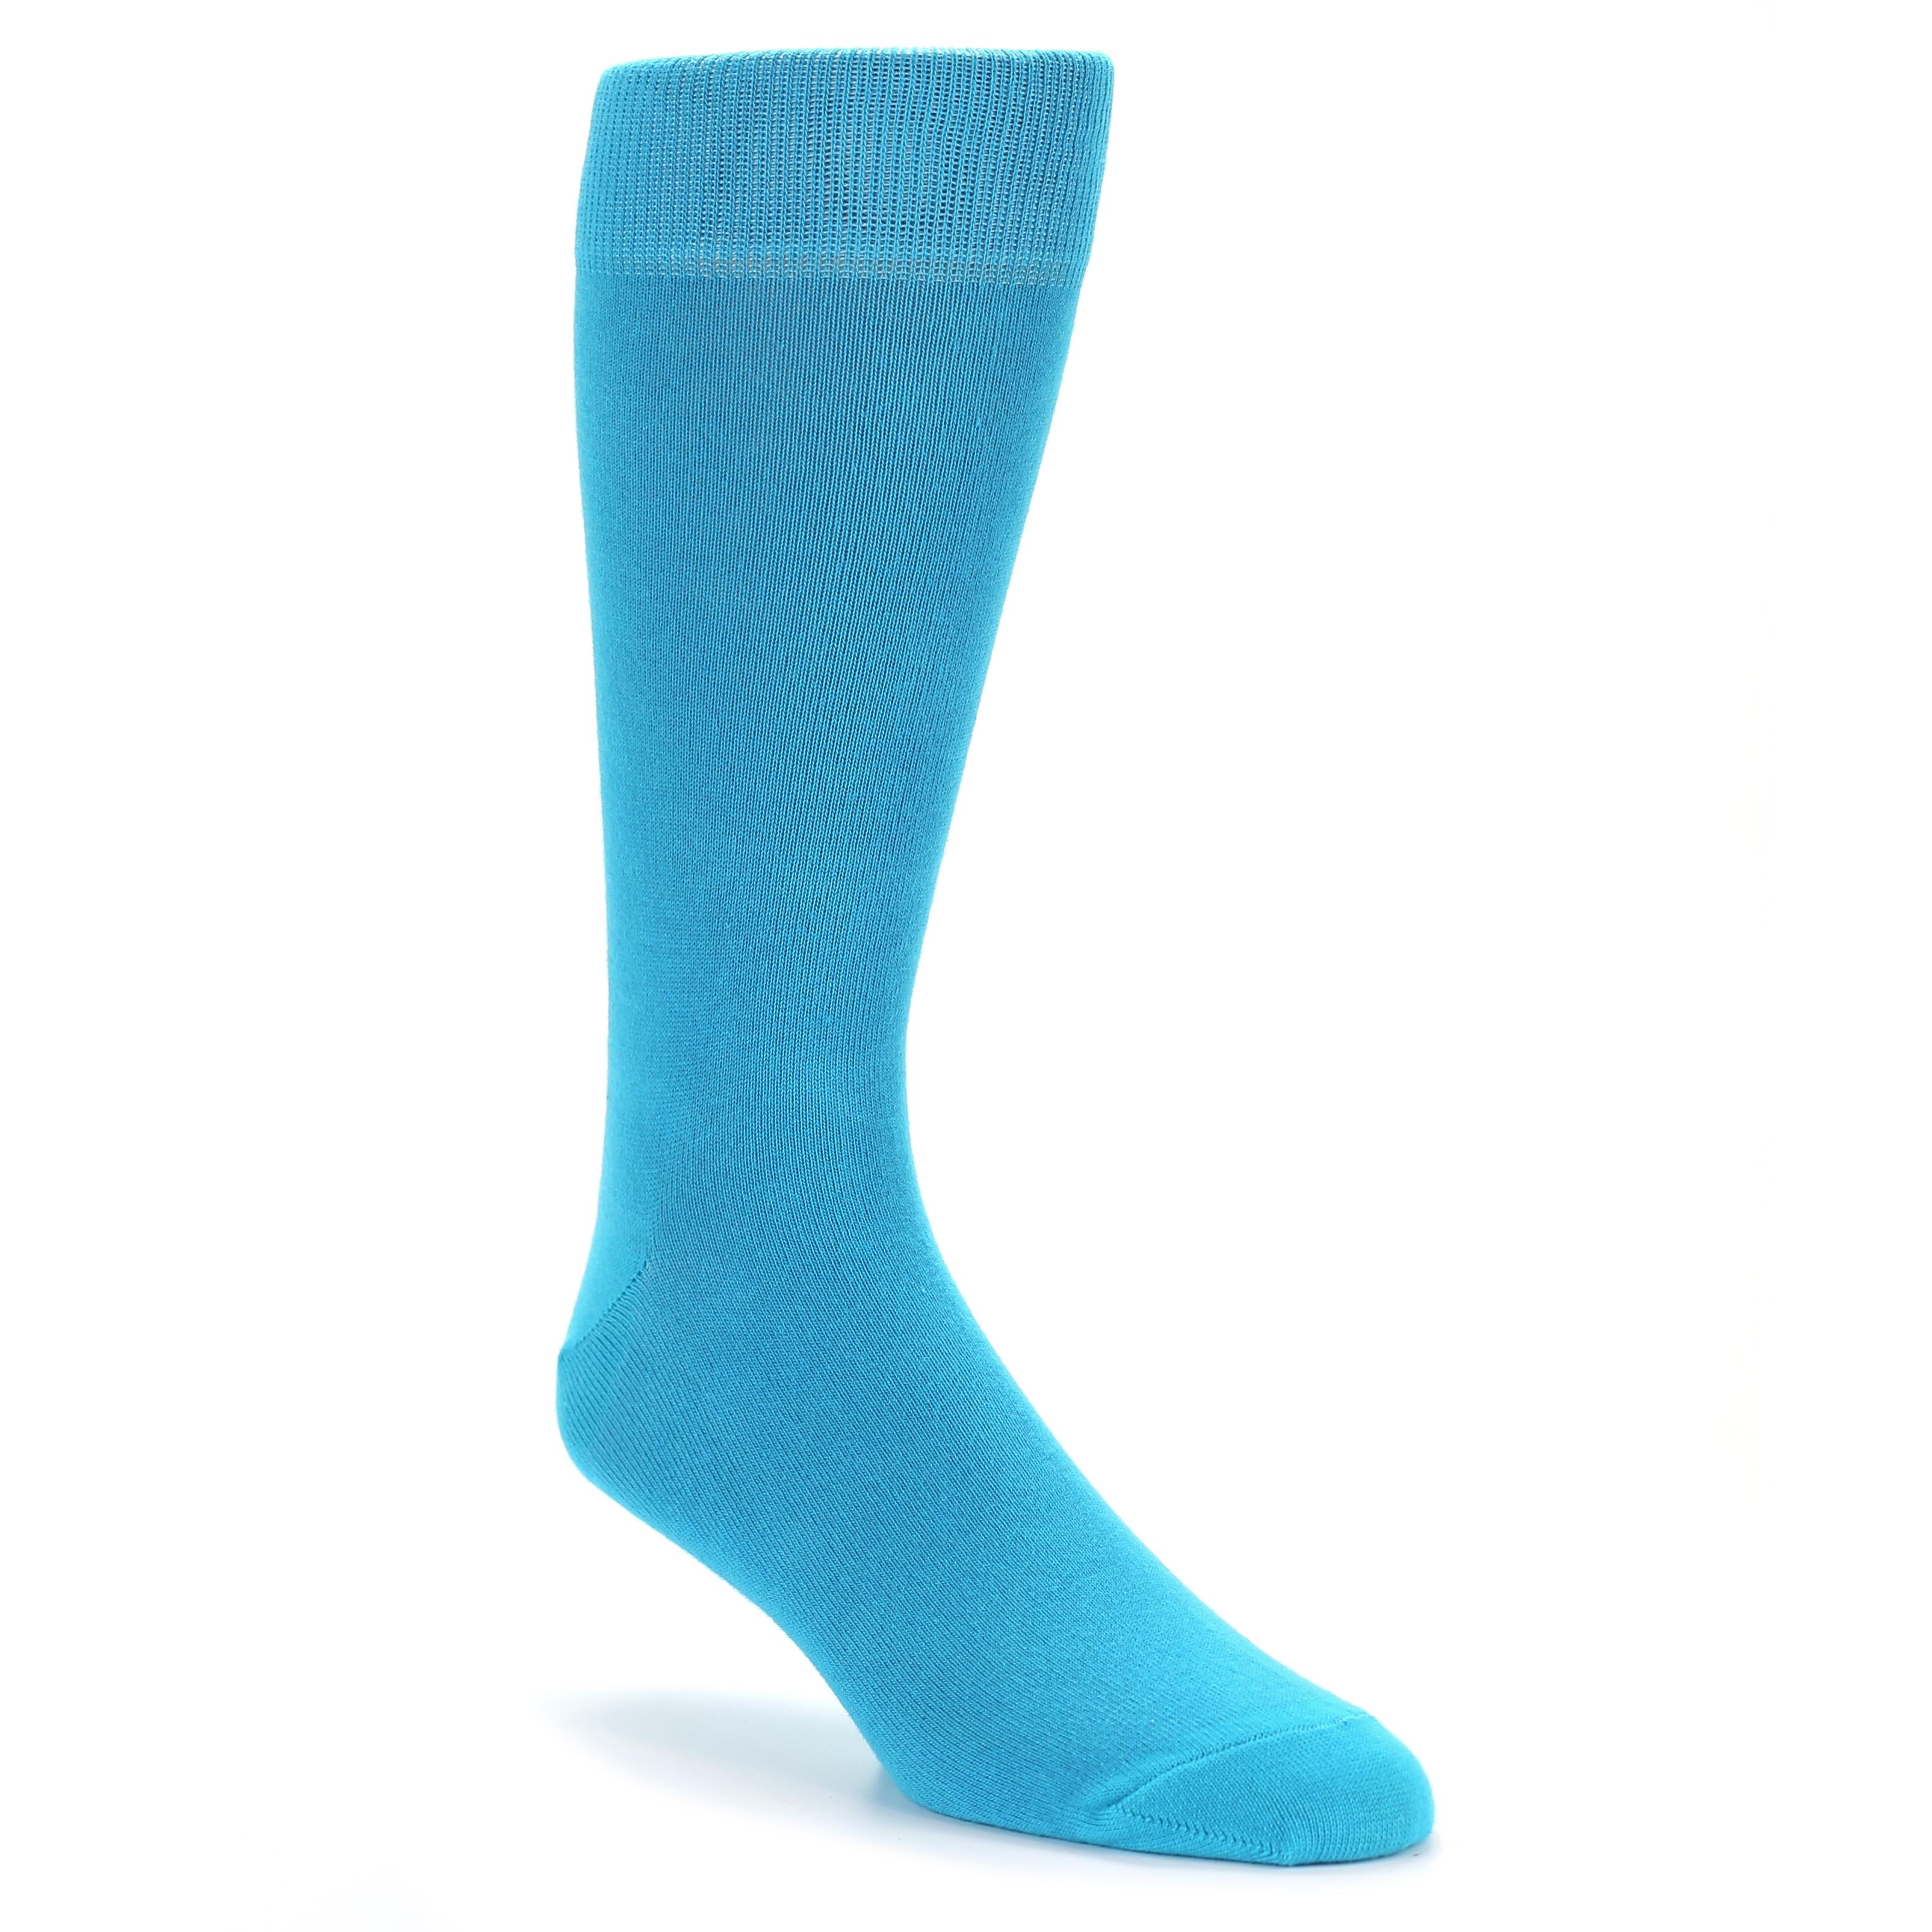 Malibu Blue Solid Color Men&39s Dress Socks – boldSOCKS